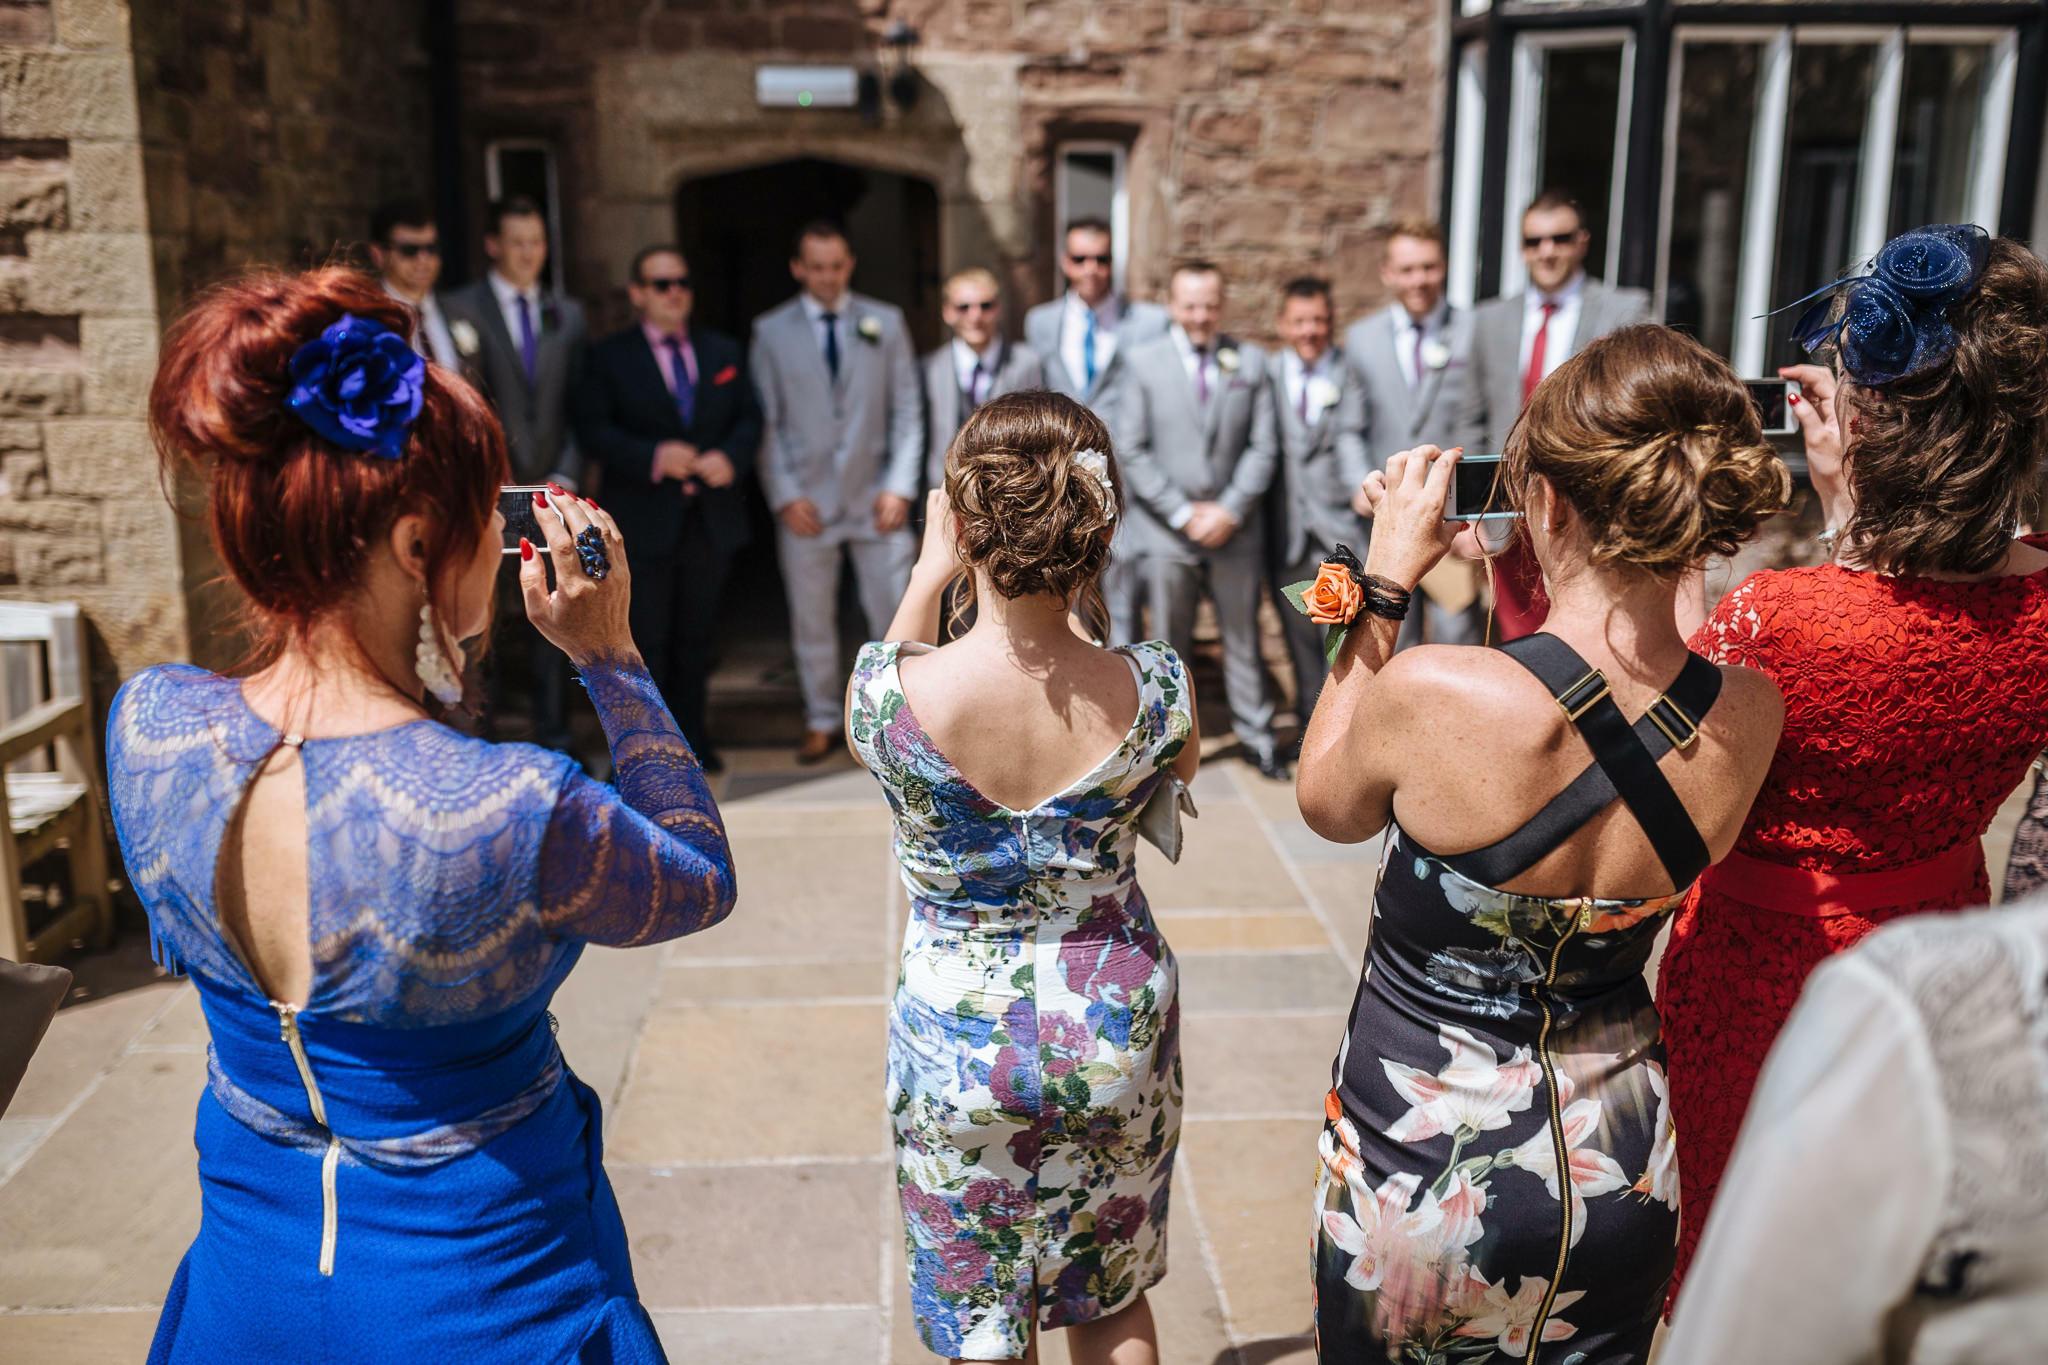 paul-marbrook-Caer-Llan-Wedding-Photographer-90035